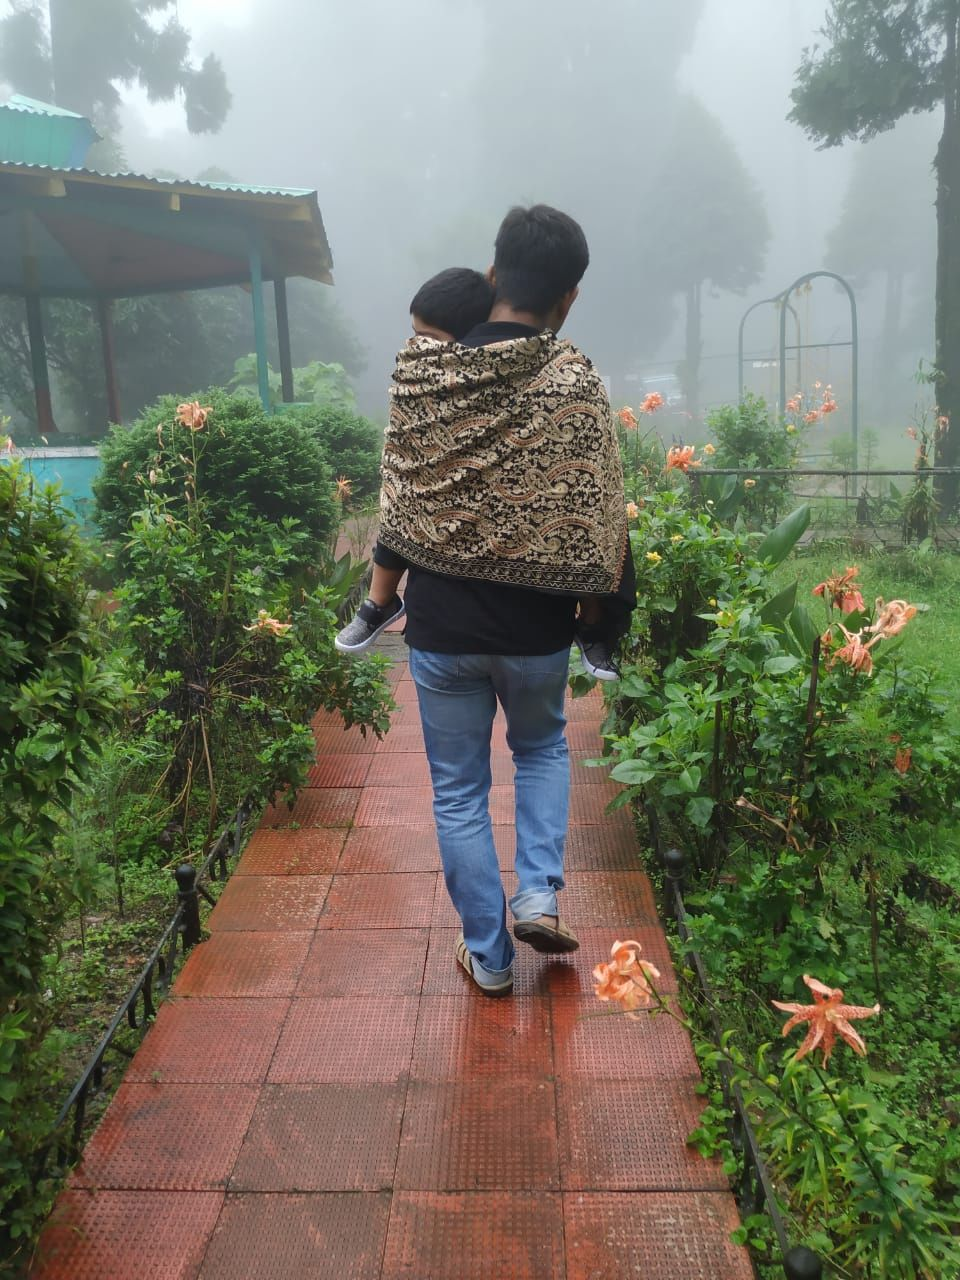 Photo of Darjeeling By arshi rahaman